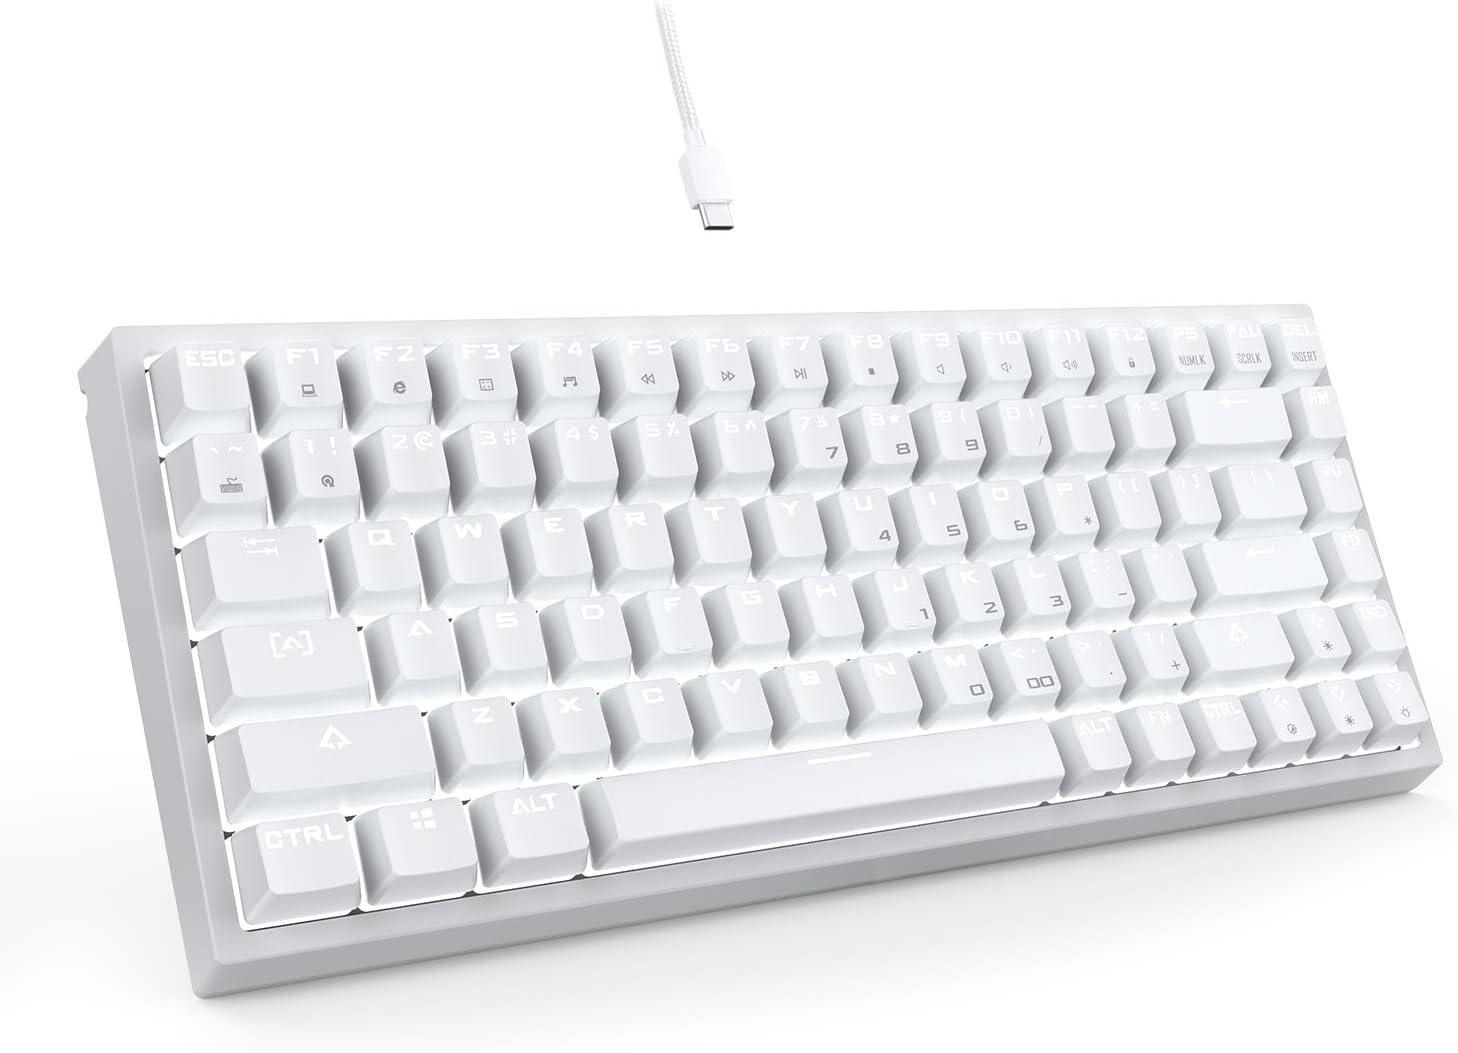 Amazon.com: DREVO Gramr 84 Key 75% TKL Mechanical Gaming Keyboard ...